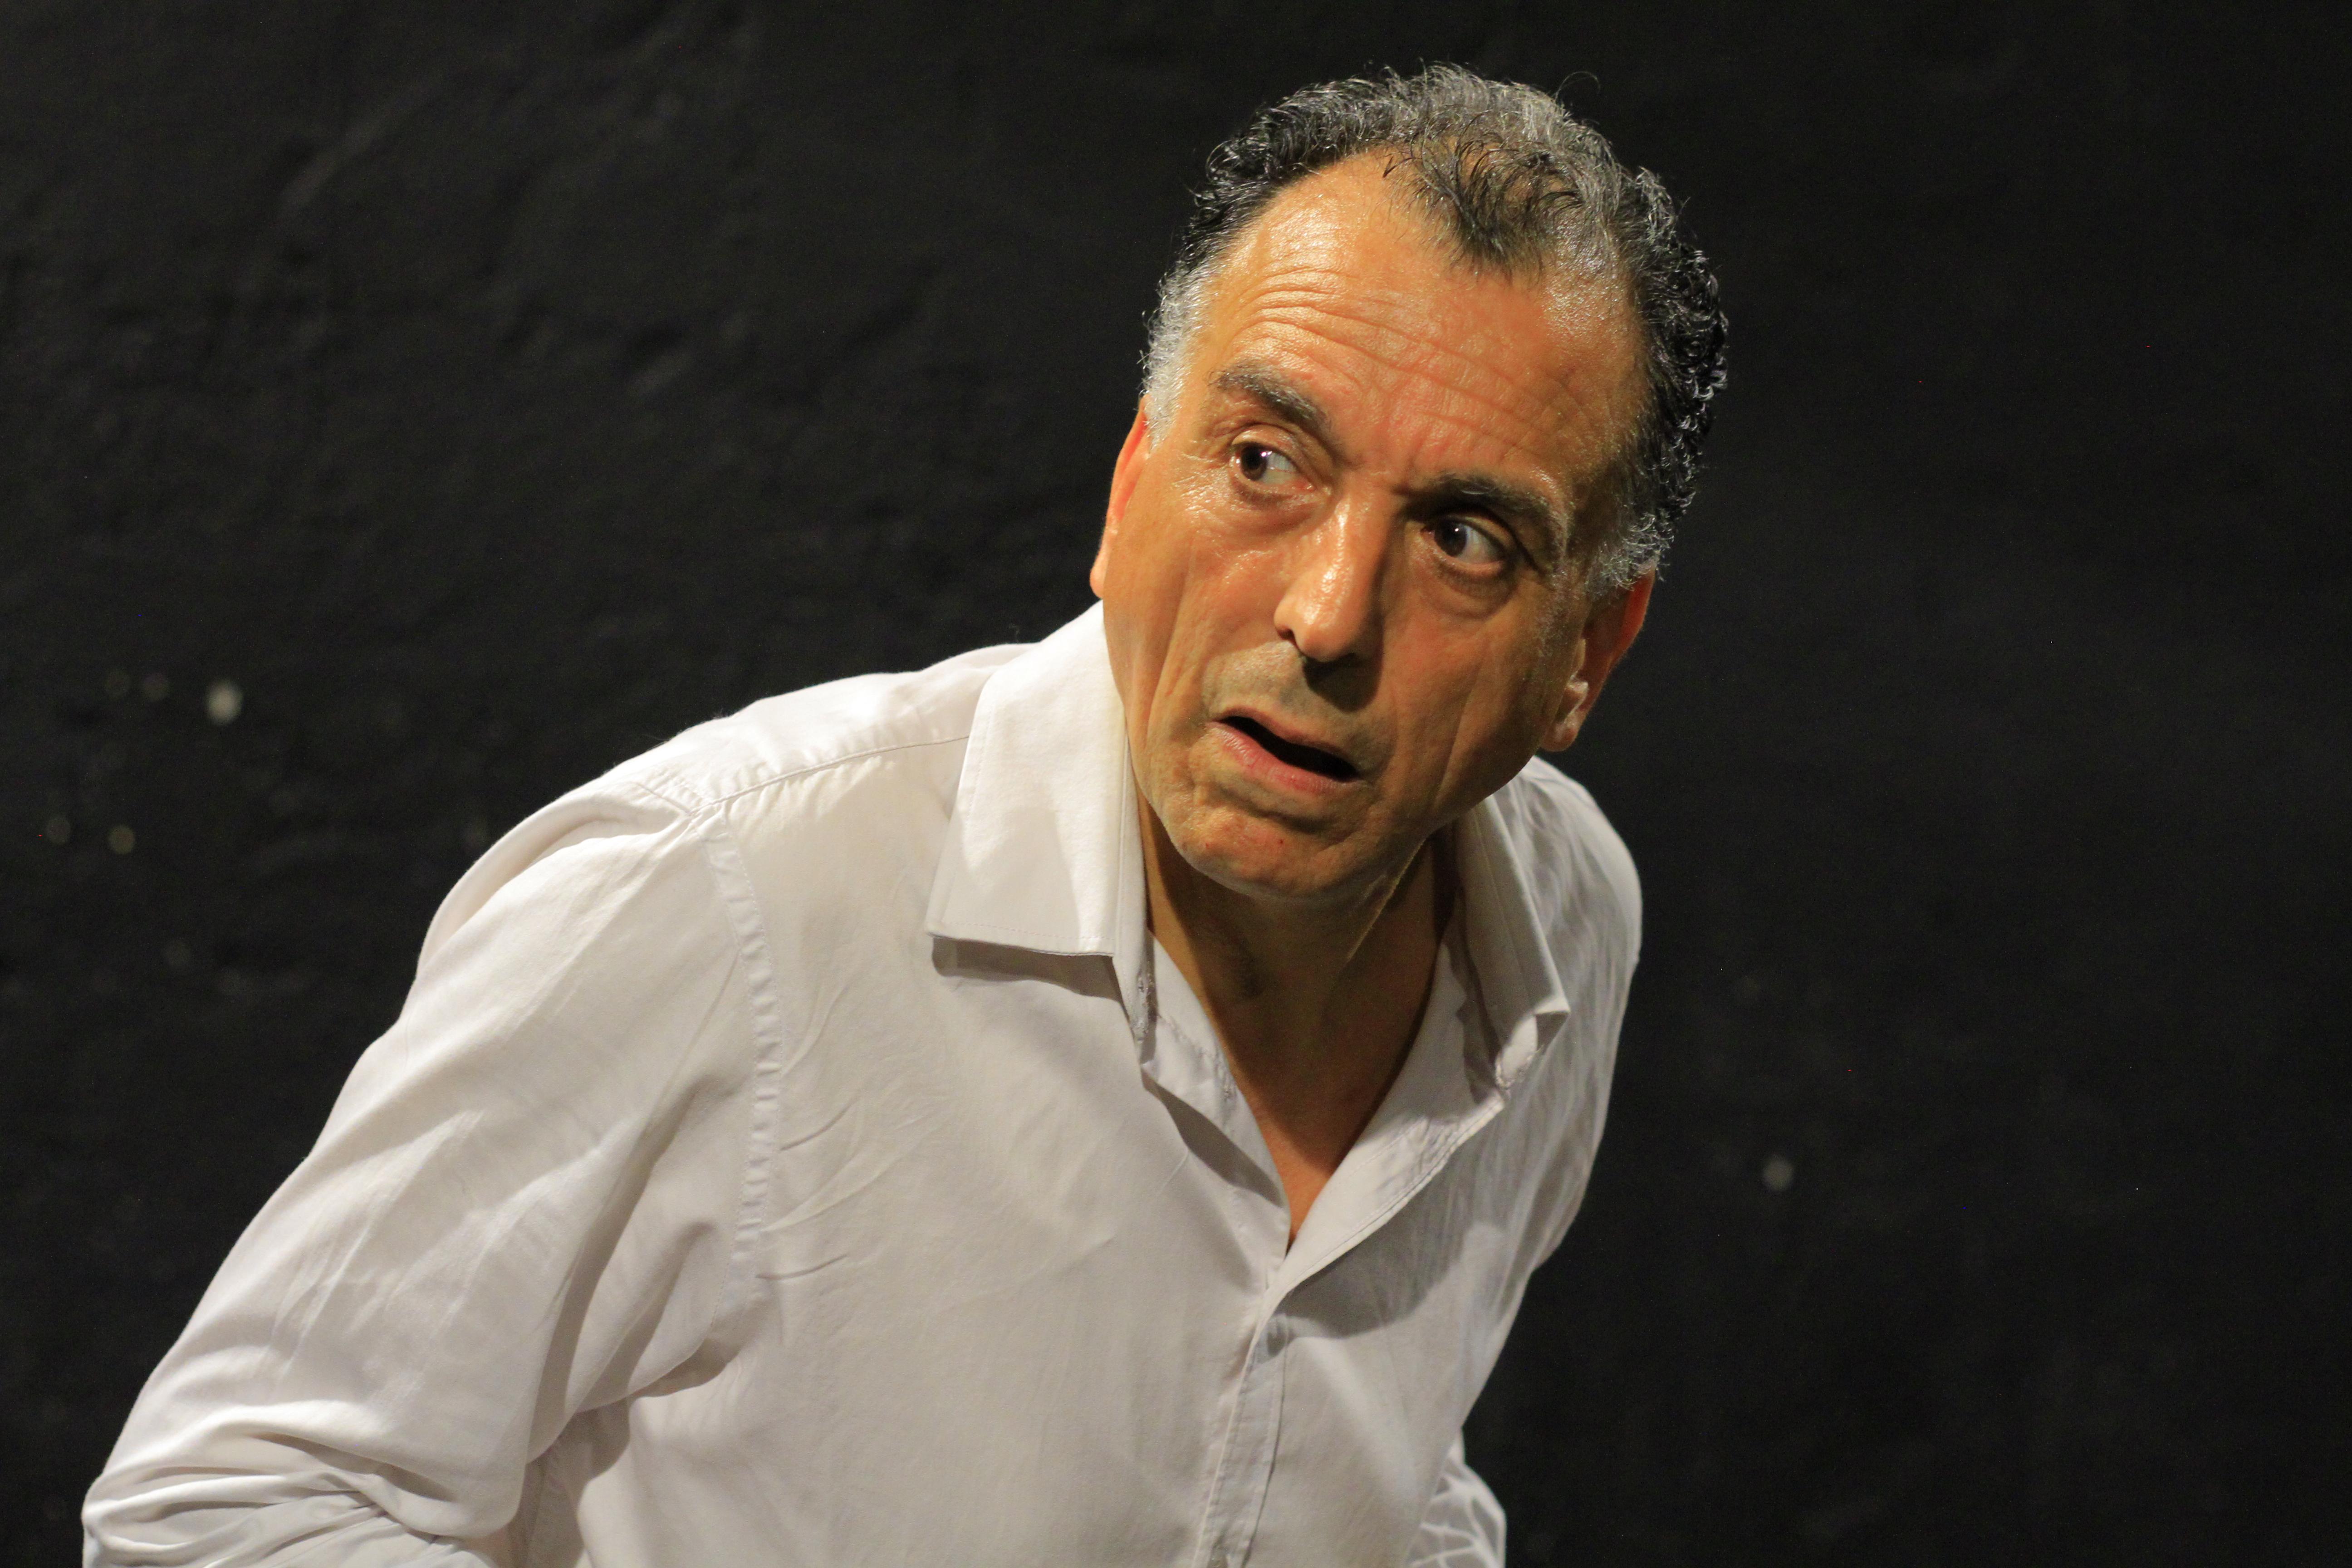 Théâtre Prémol - Ali Djilali